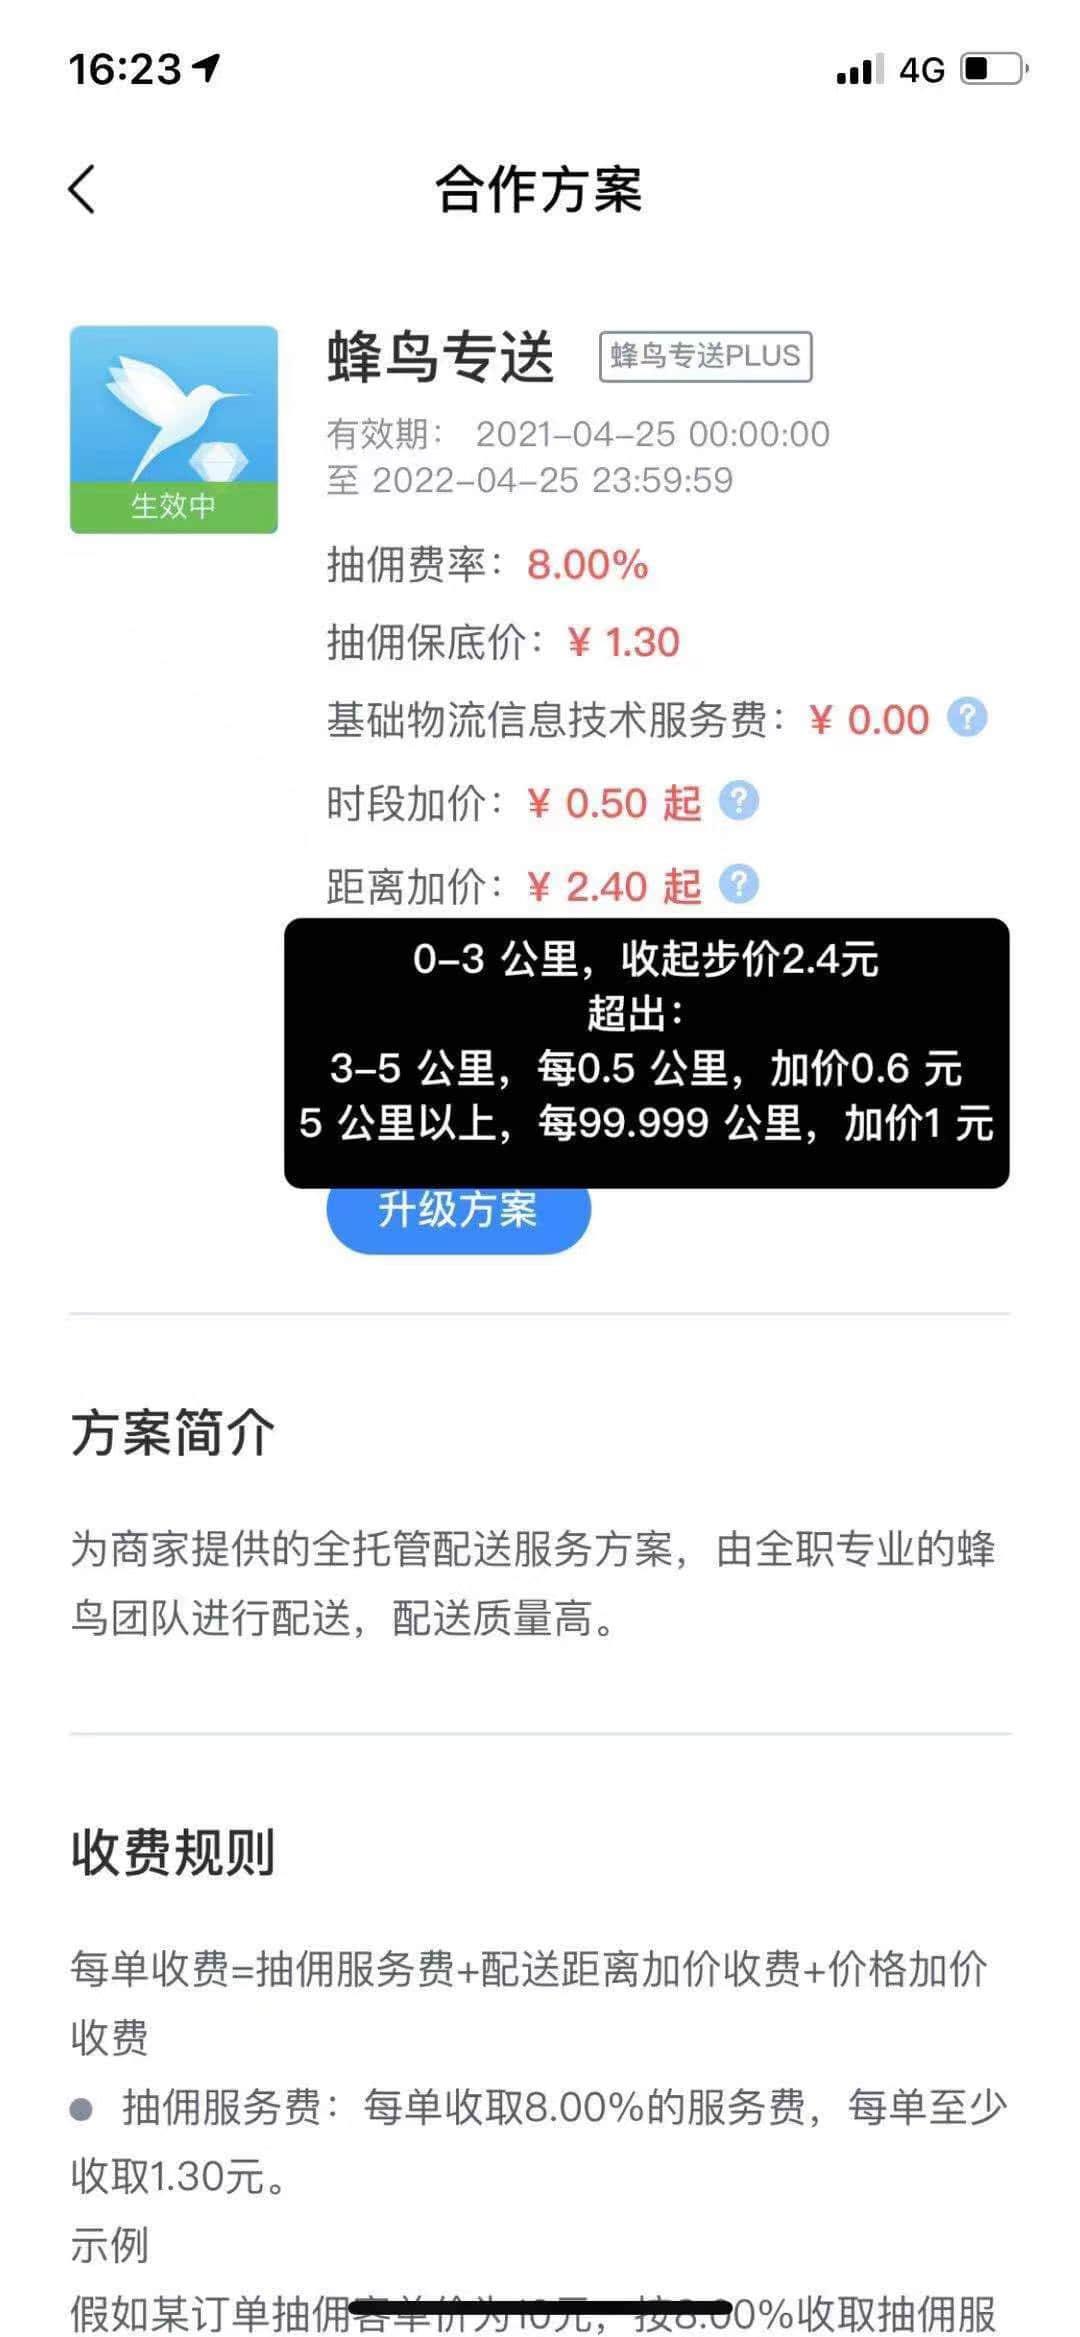 Macintosh HD:Users:guowenjie:Downloads:B1.jpg